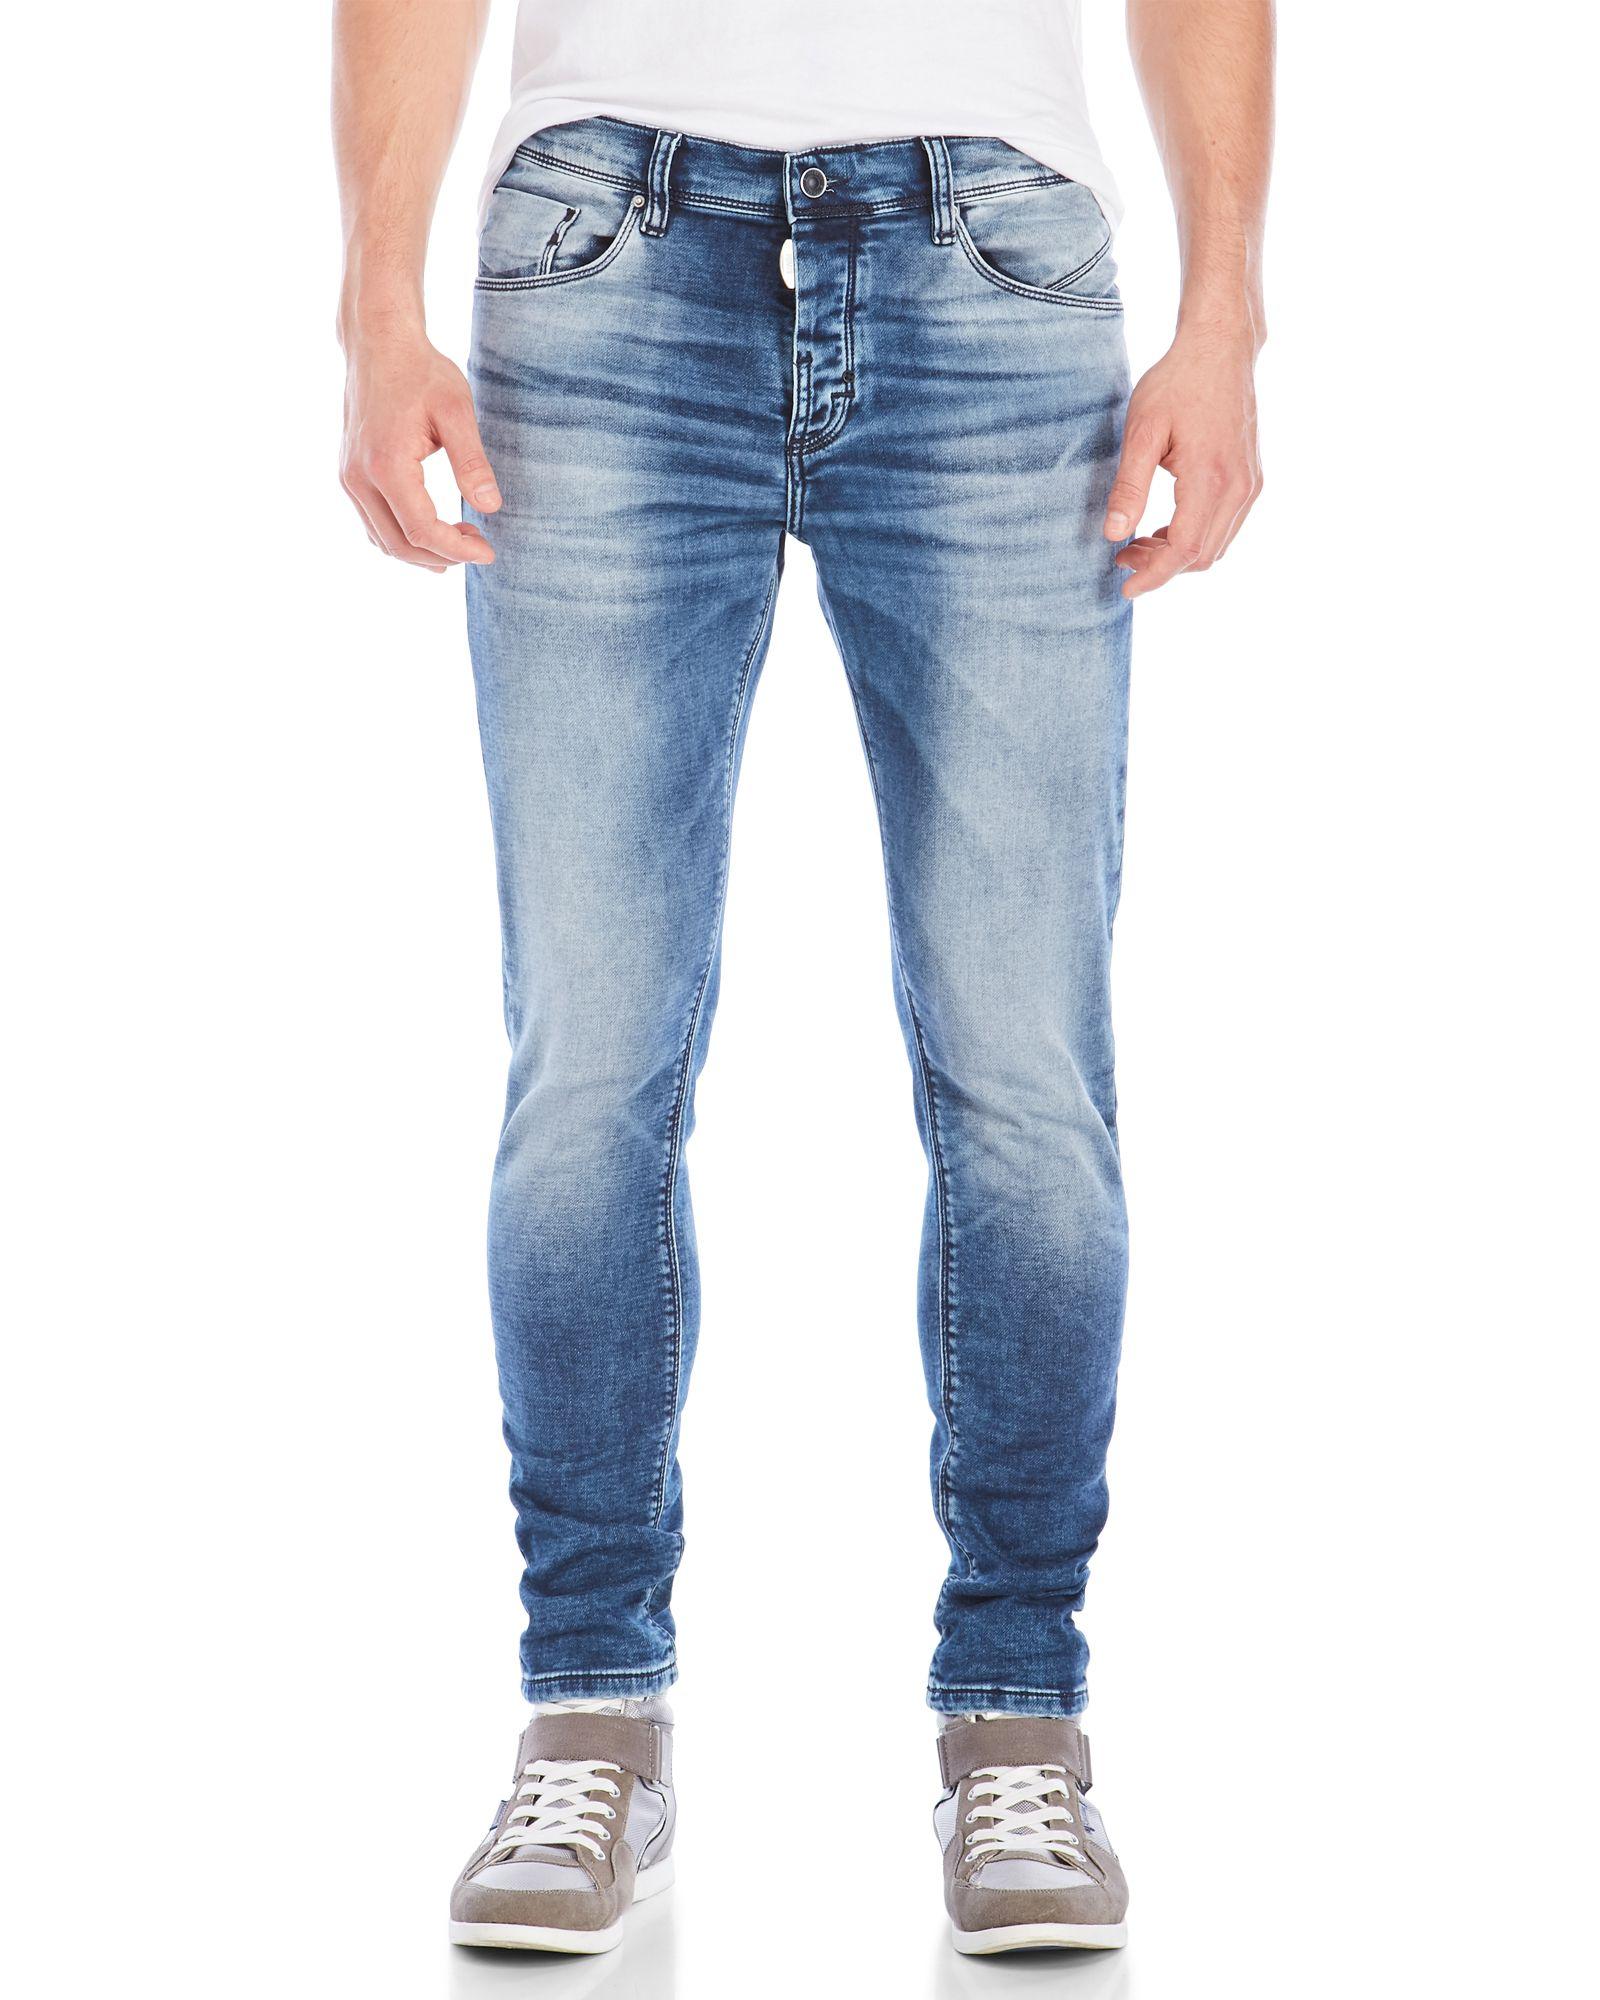 Antony Morato Duran Flex Carrot Stretch Jeans 0cc80bd1be0